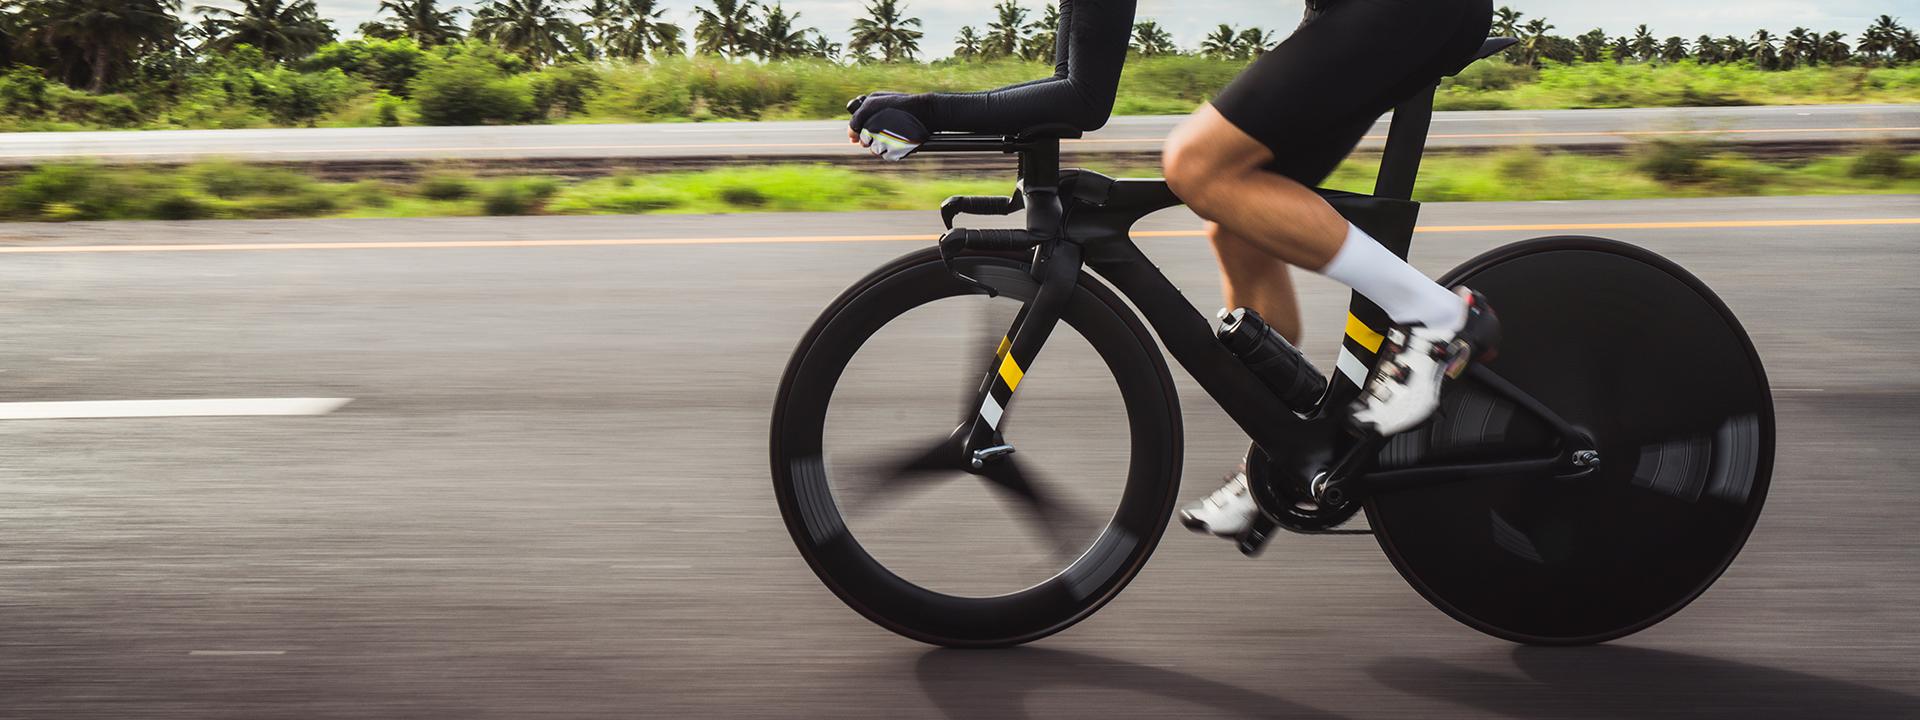 Фото шоссейного велосипеда на трассе